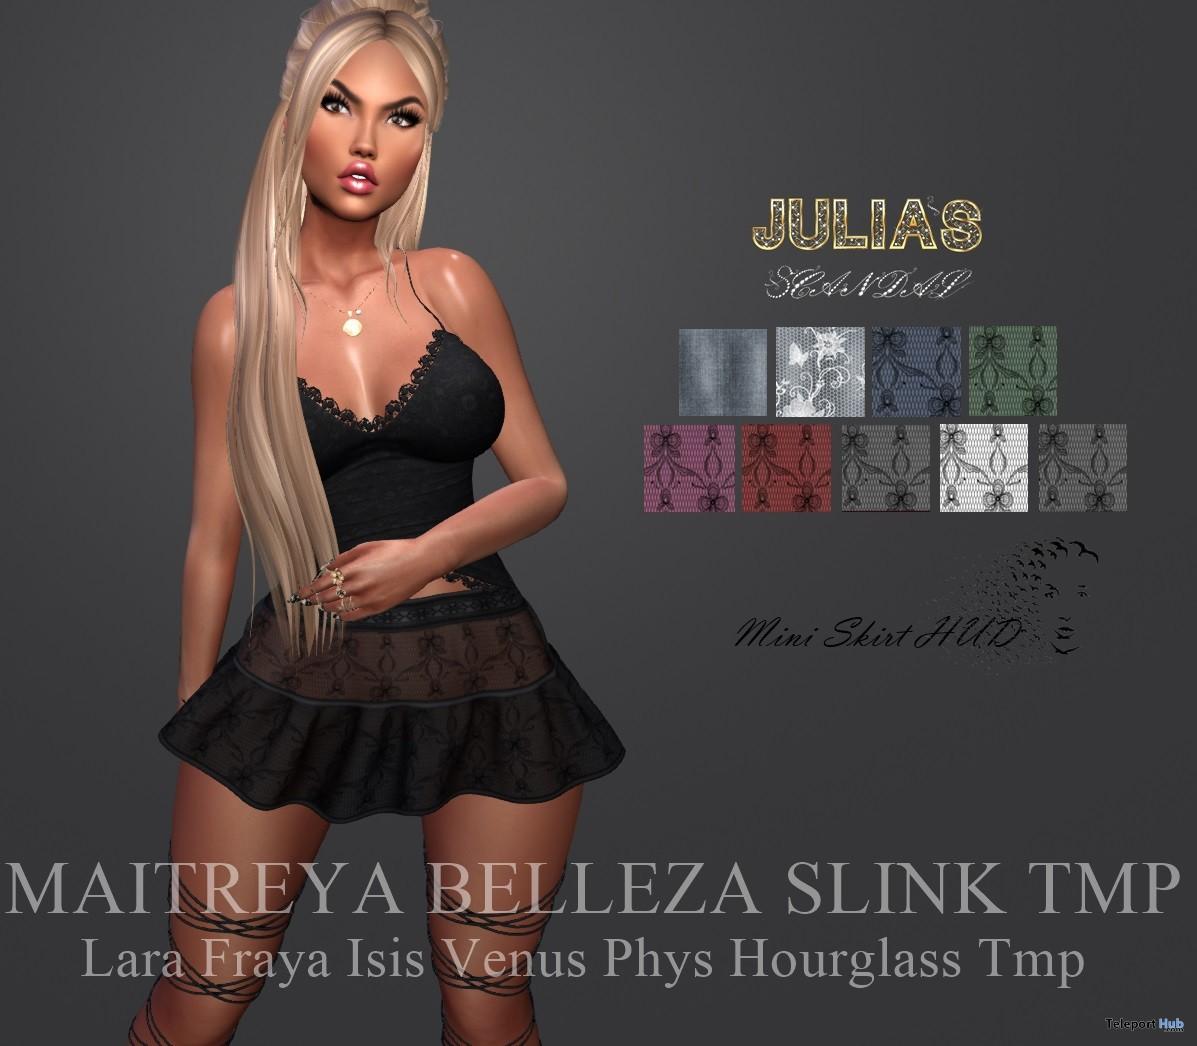 Mini Skirt Group Gift by Julia's Scandal - Teleport Hub - teleporthub.com